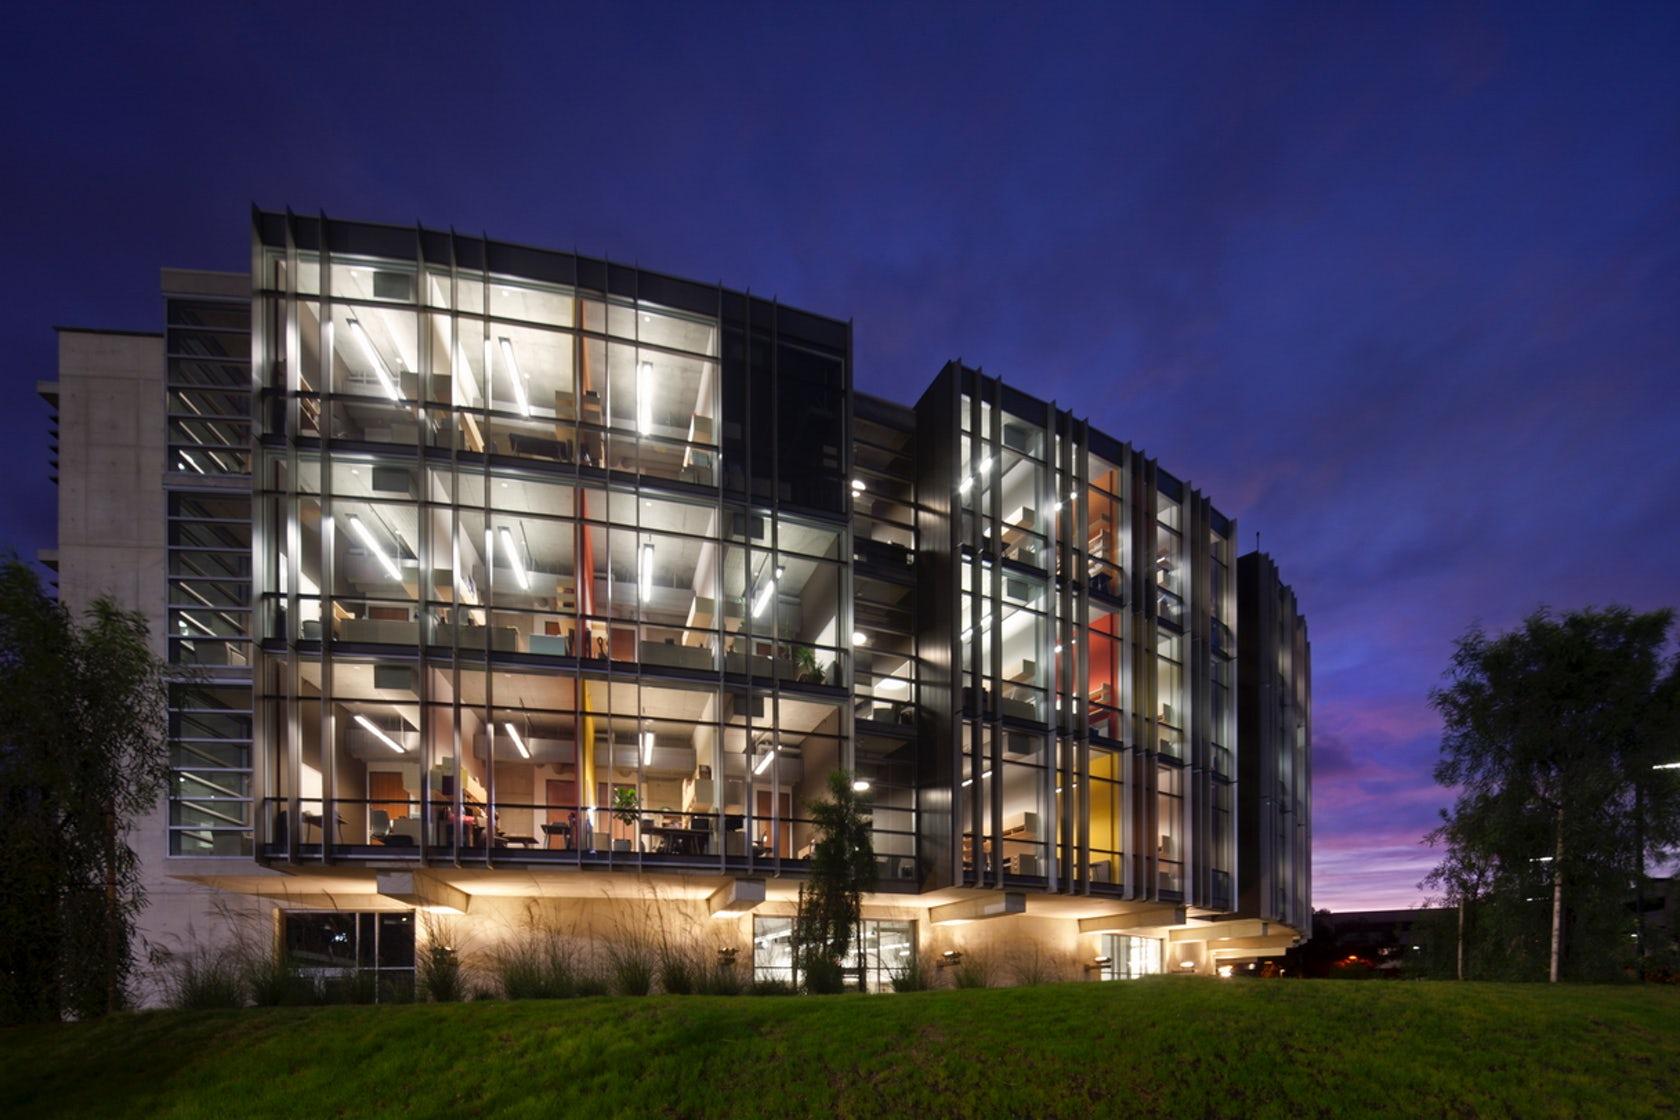 ucsd engineering building | San diego